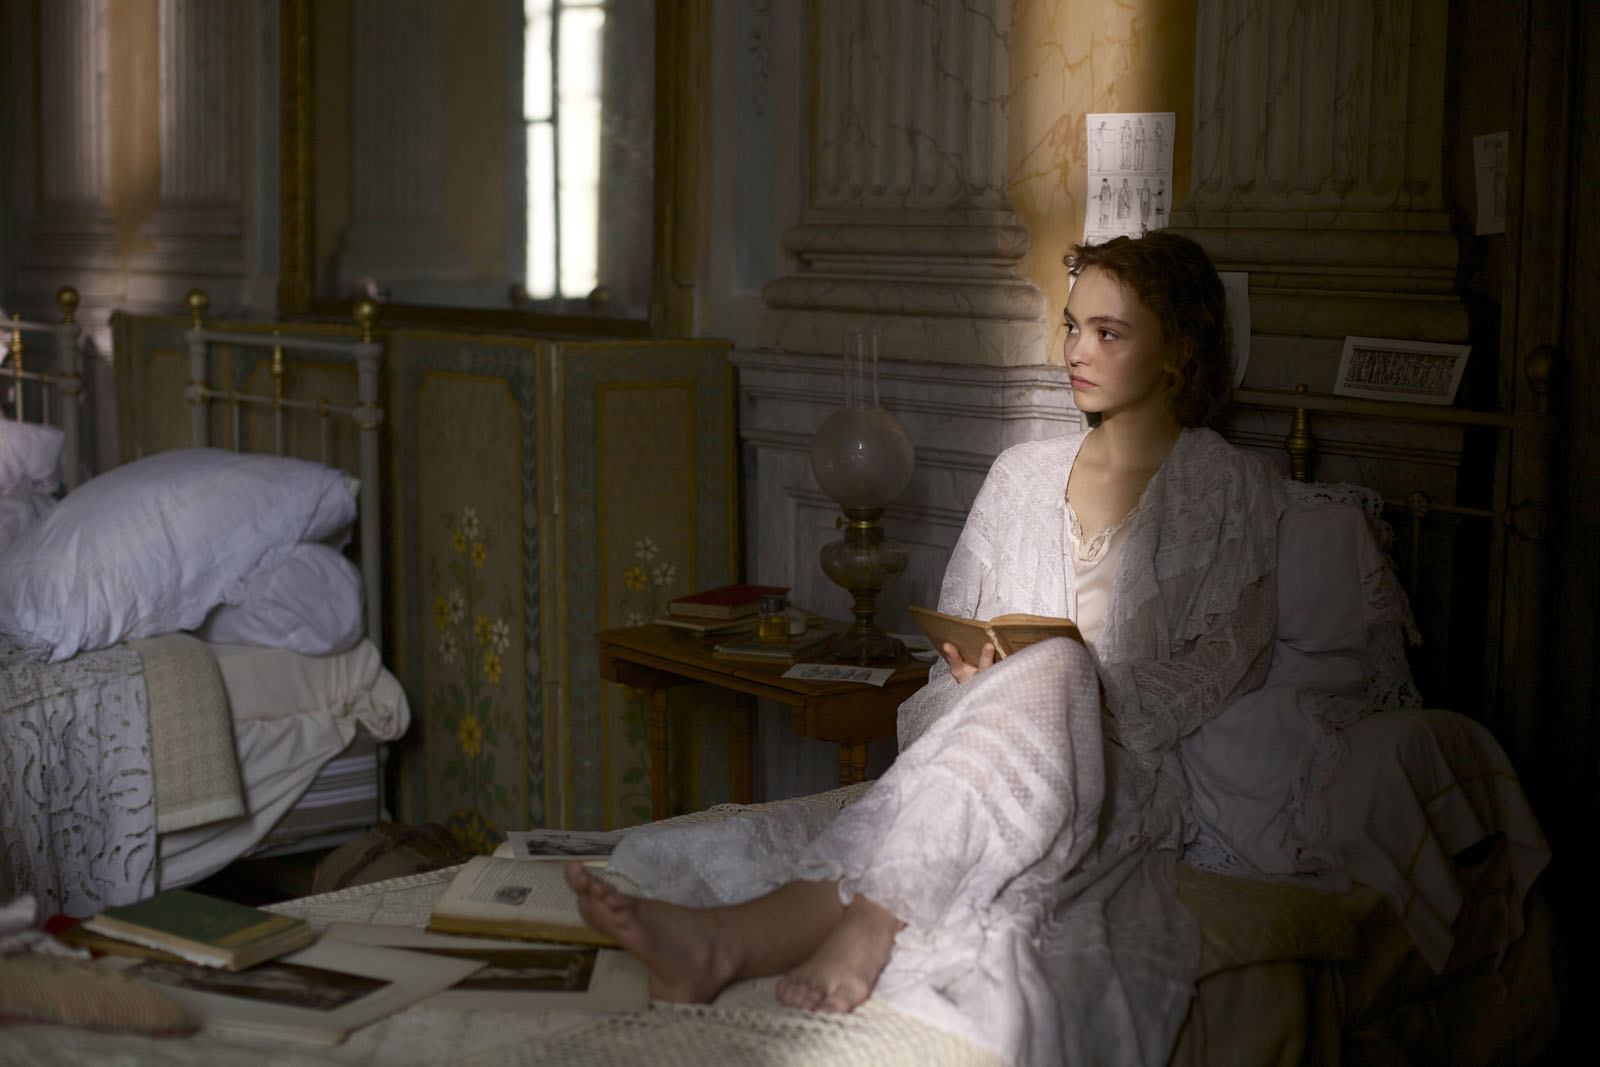 La Danseuse - Lily-Rose Depp